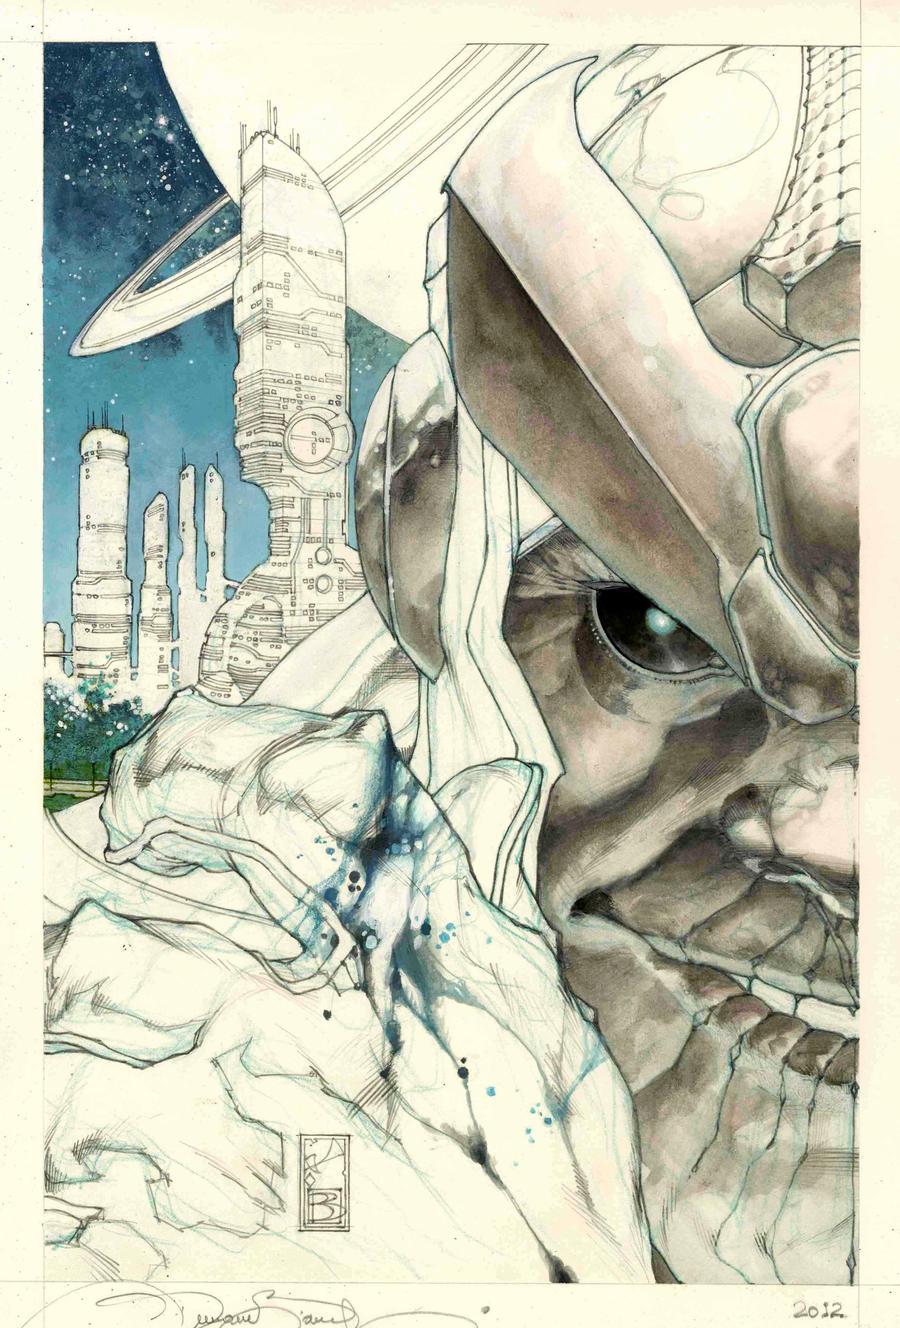 Thanos Rising # 1 cover pencil preliminary by simonebianchi